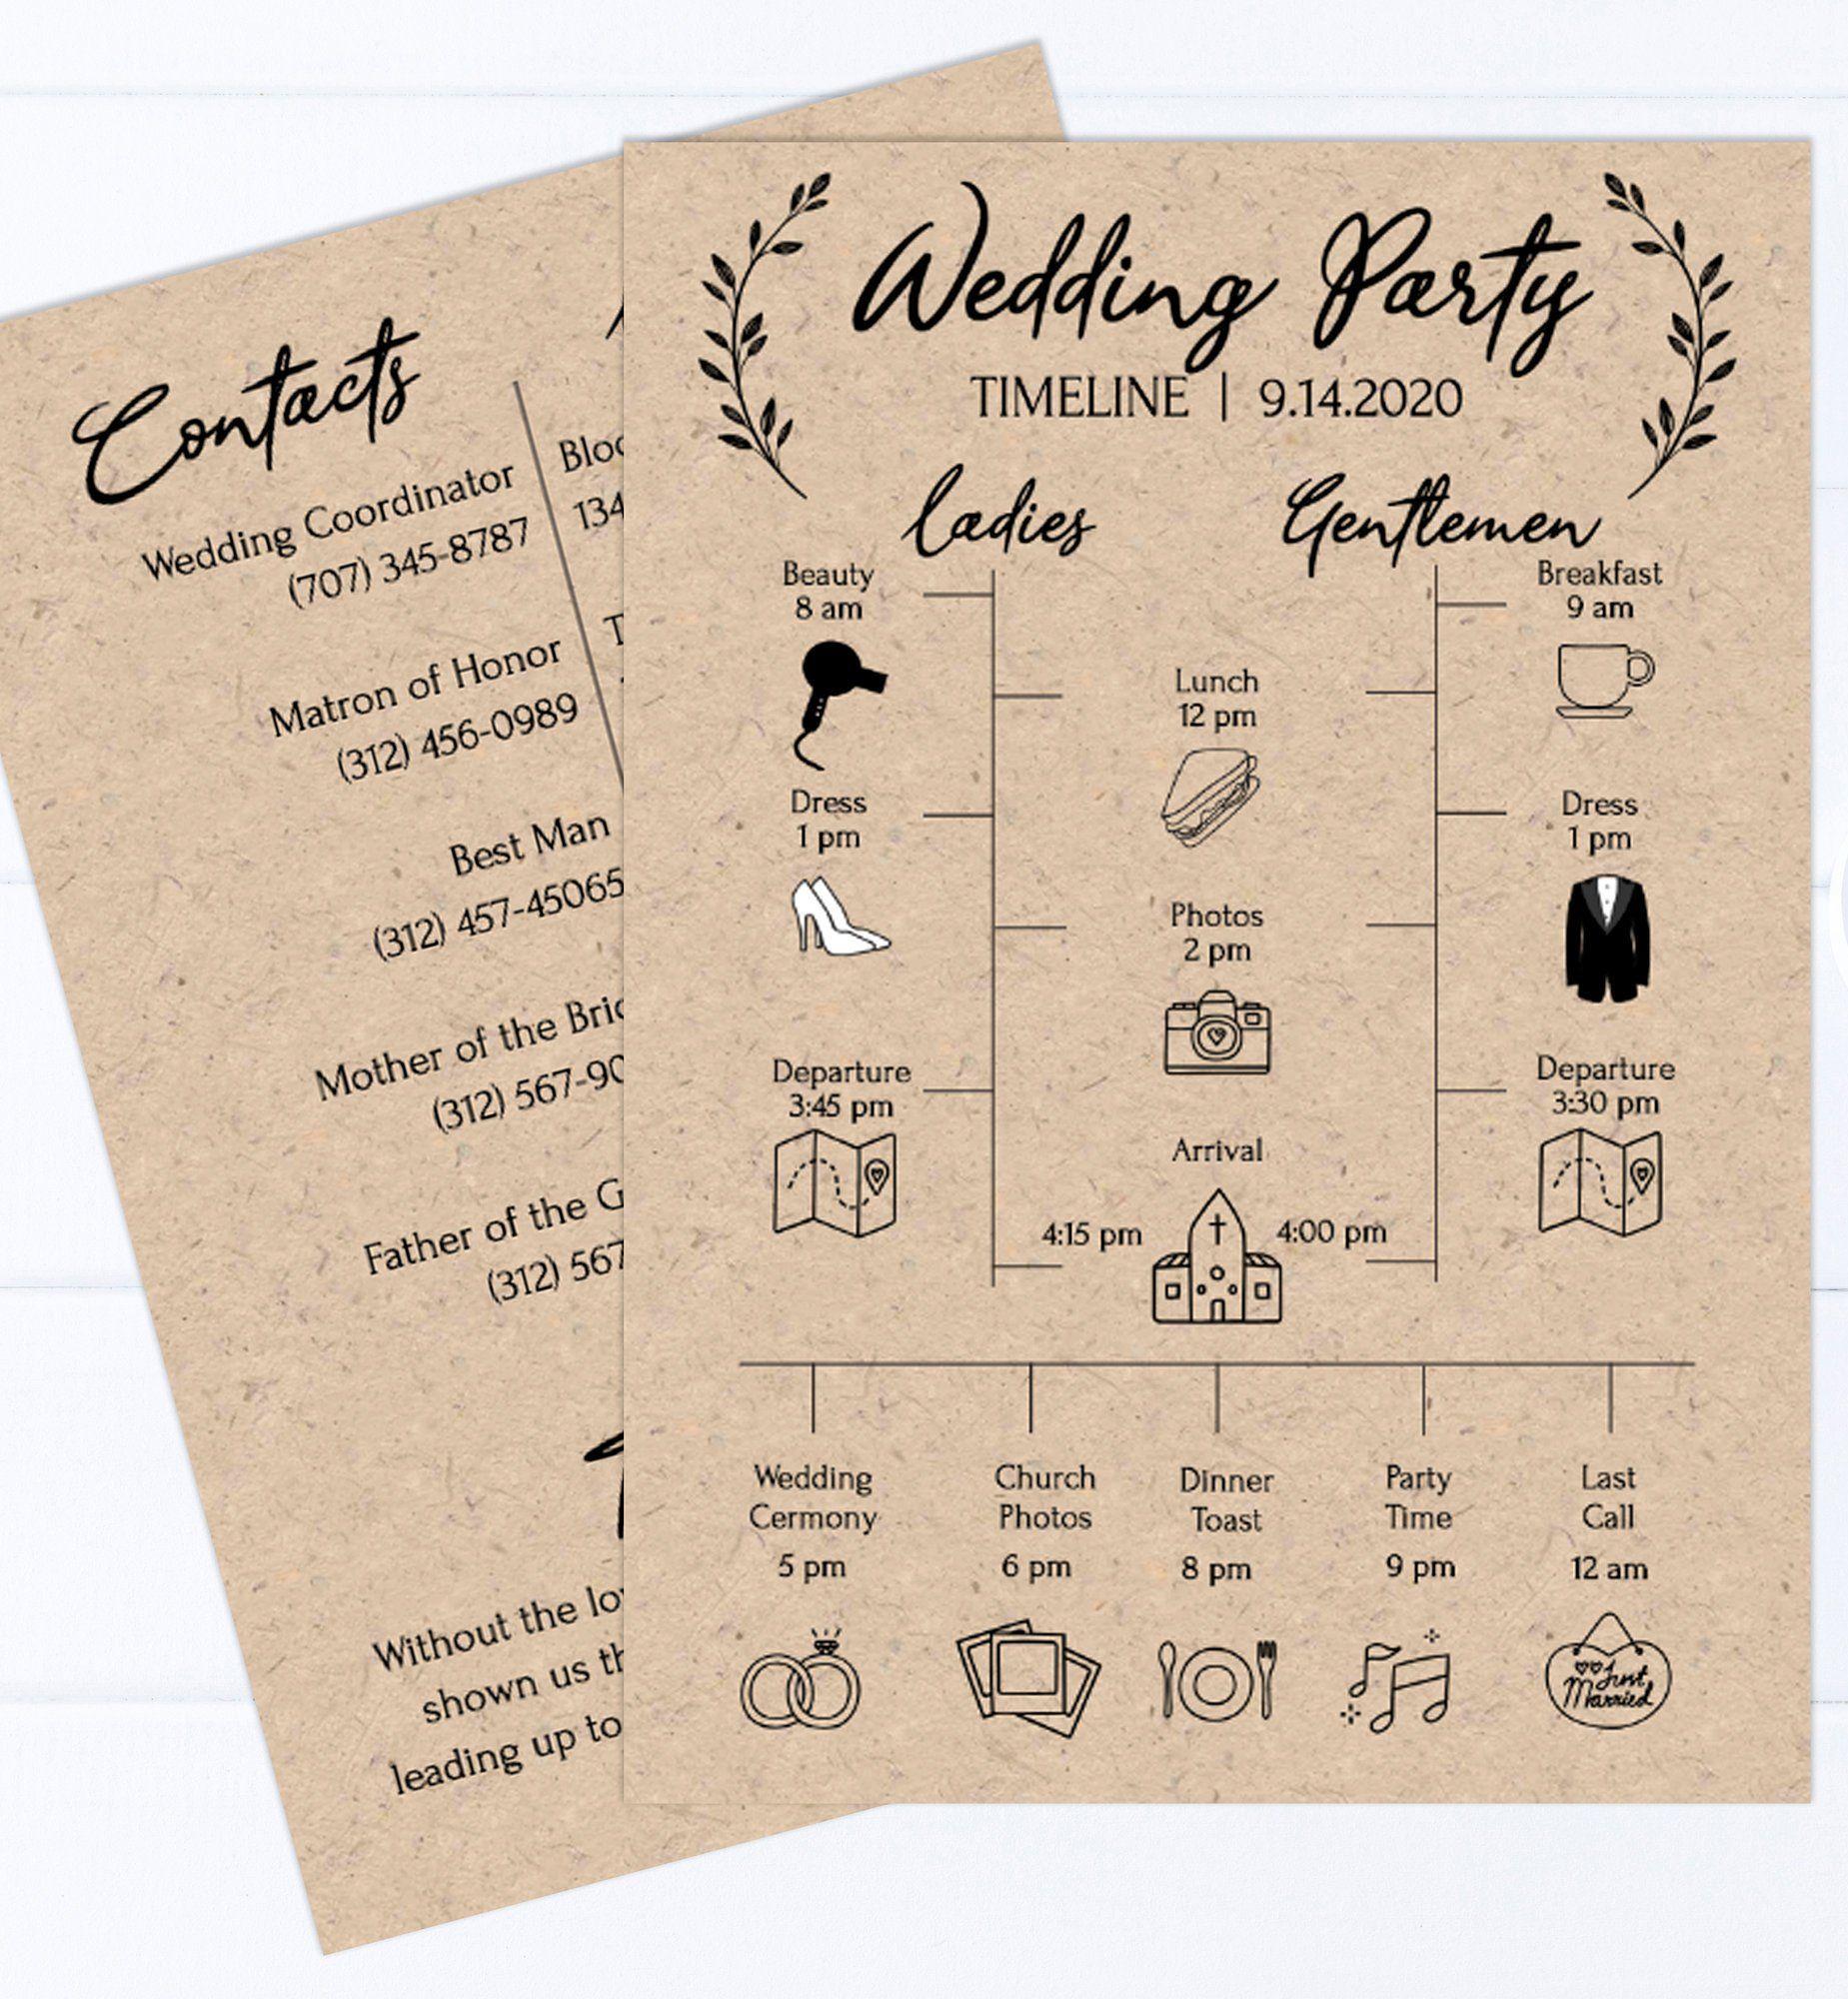 Rustic Wedding Party Timeline Printable Wedding Day